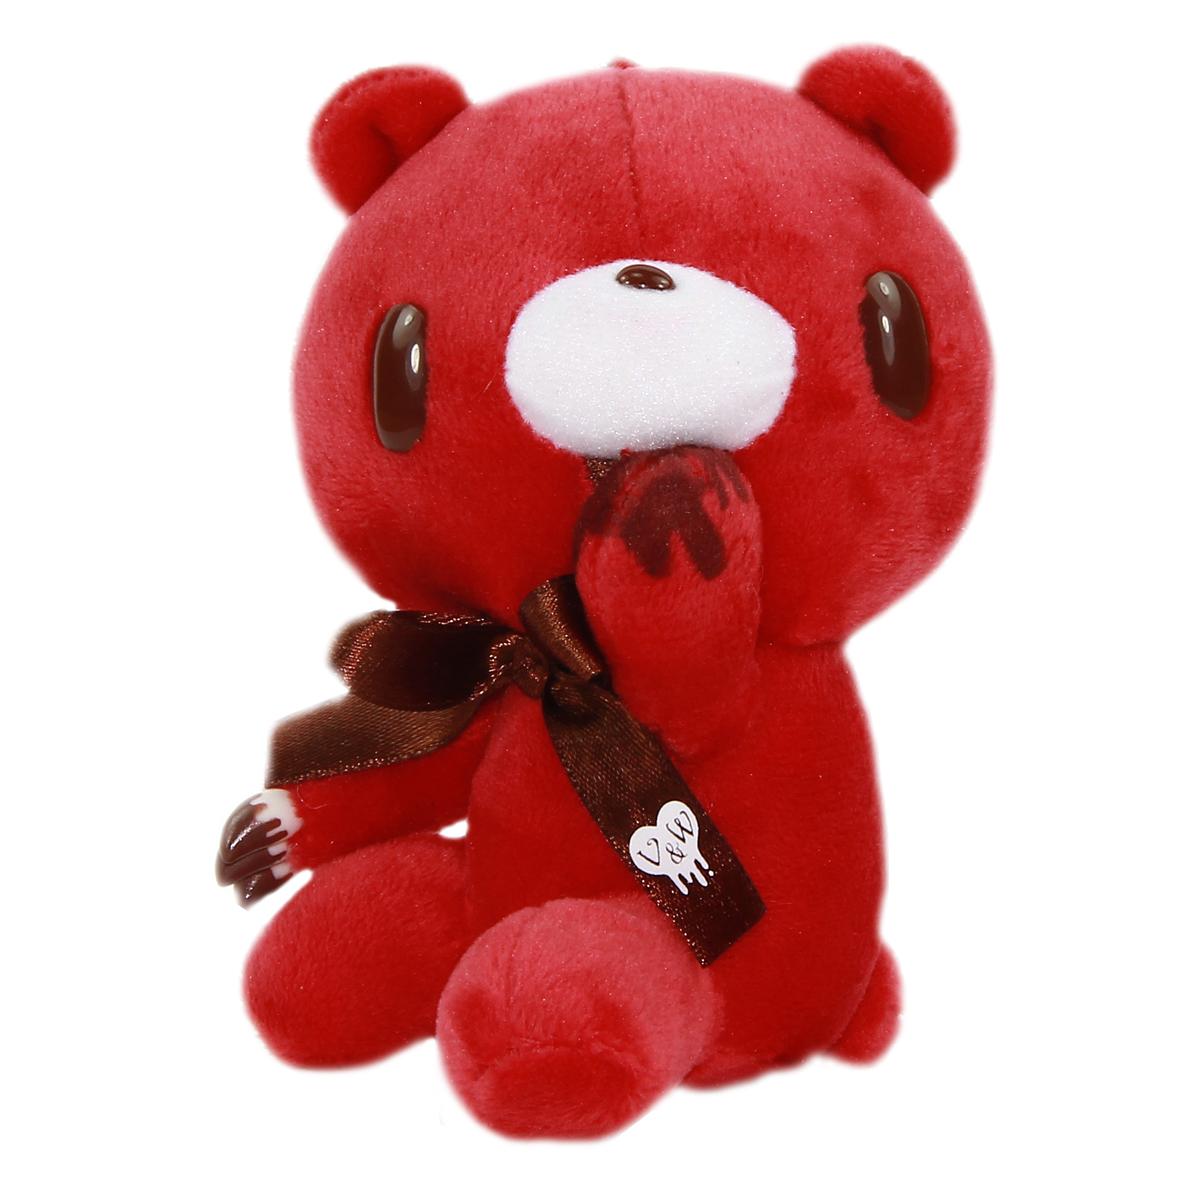 Taito Gloomy Bear Plush Doll Chocolate Sweet V & W Stuffed Animal Japan Red